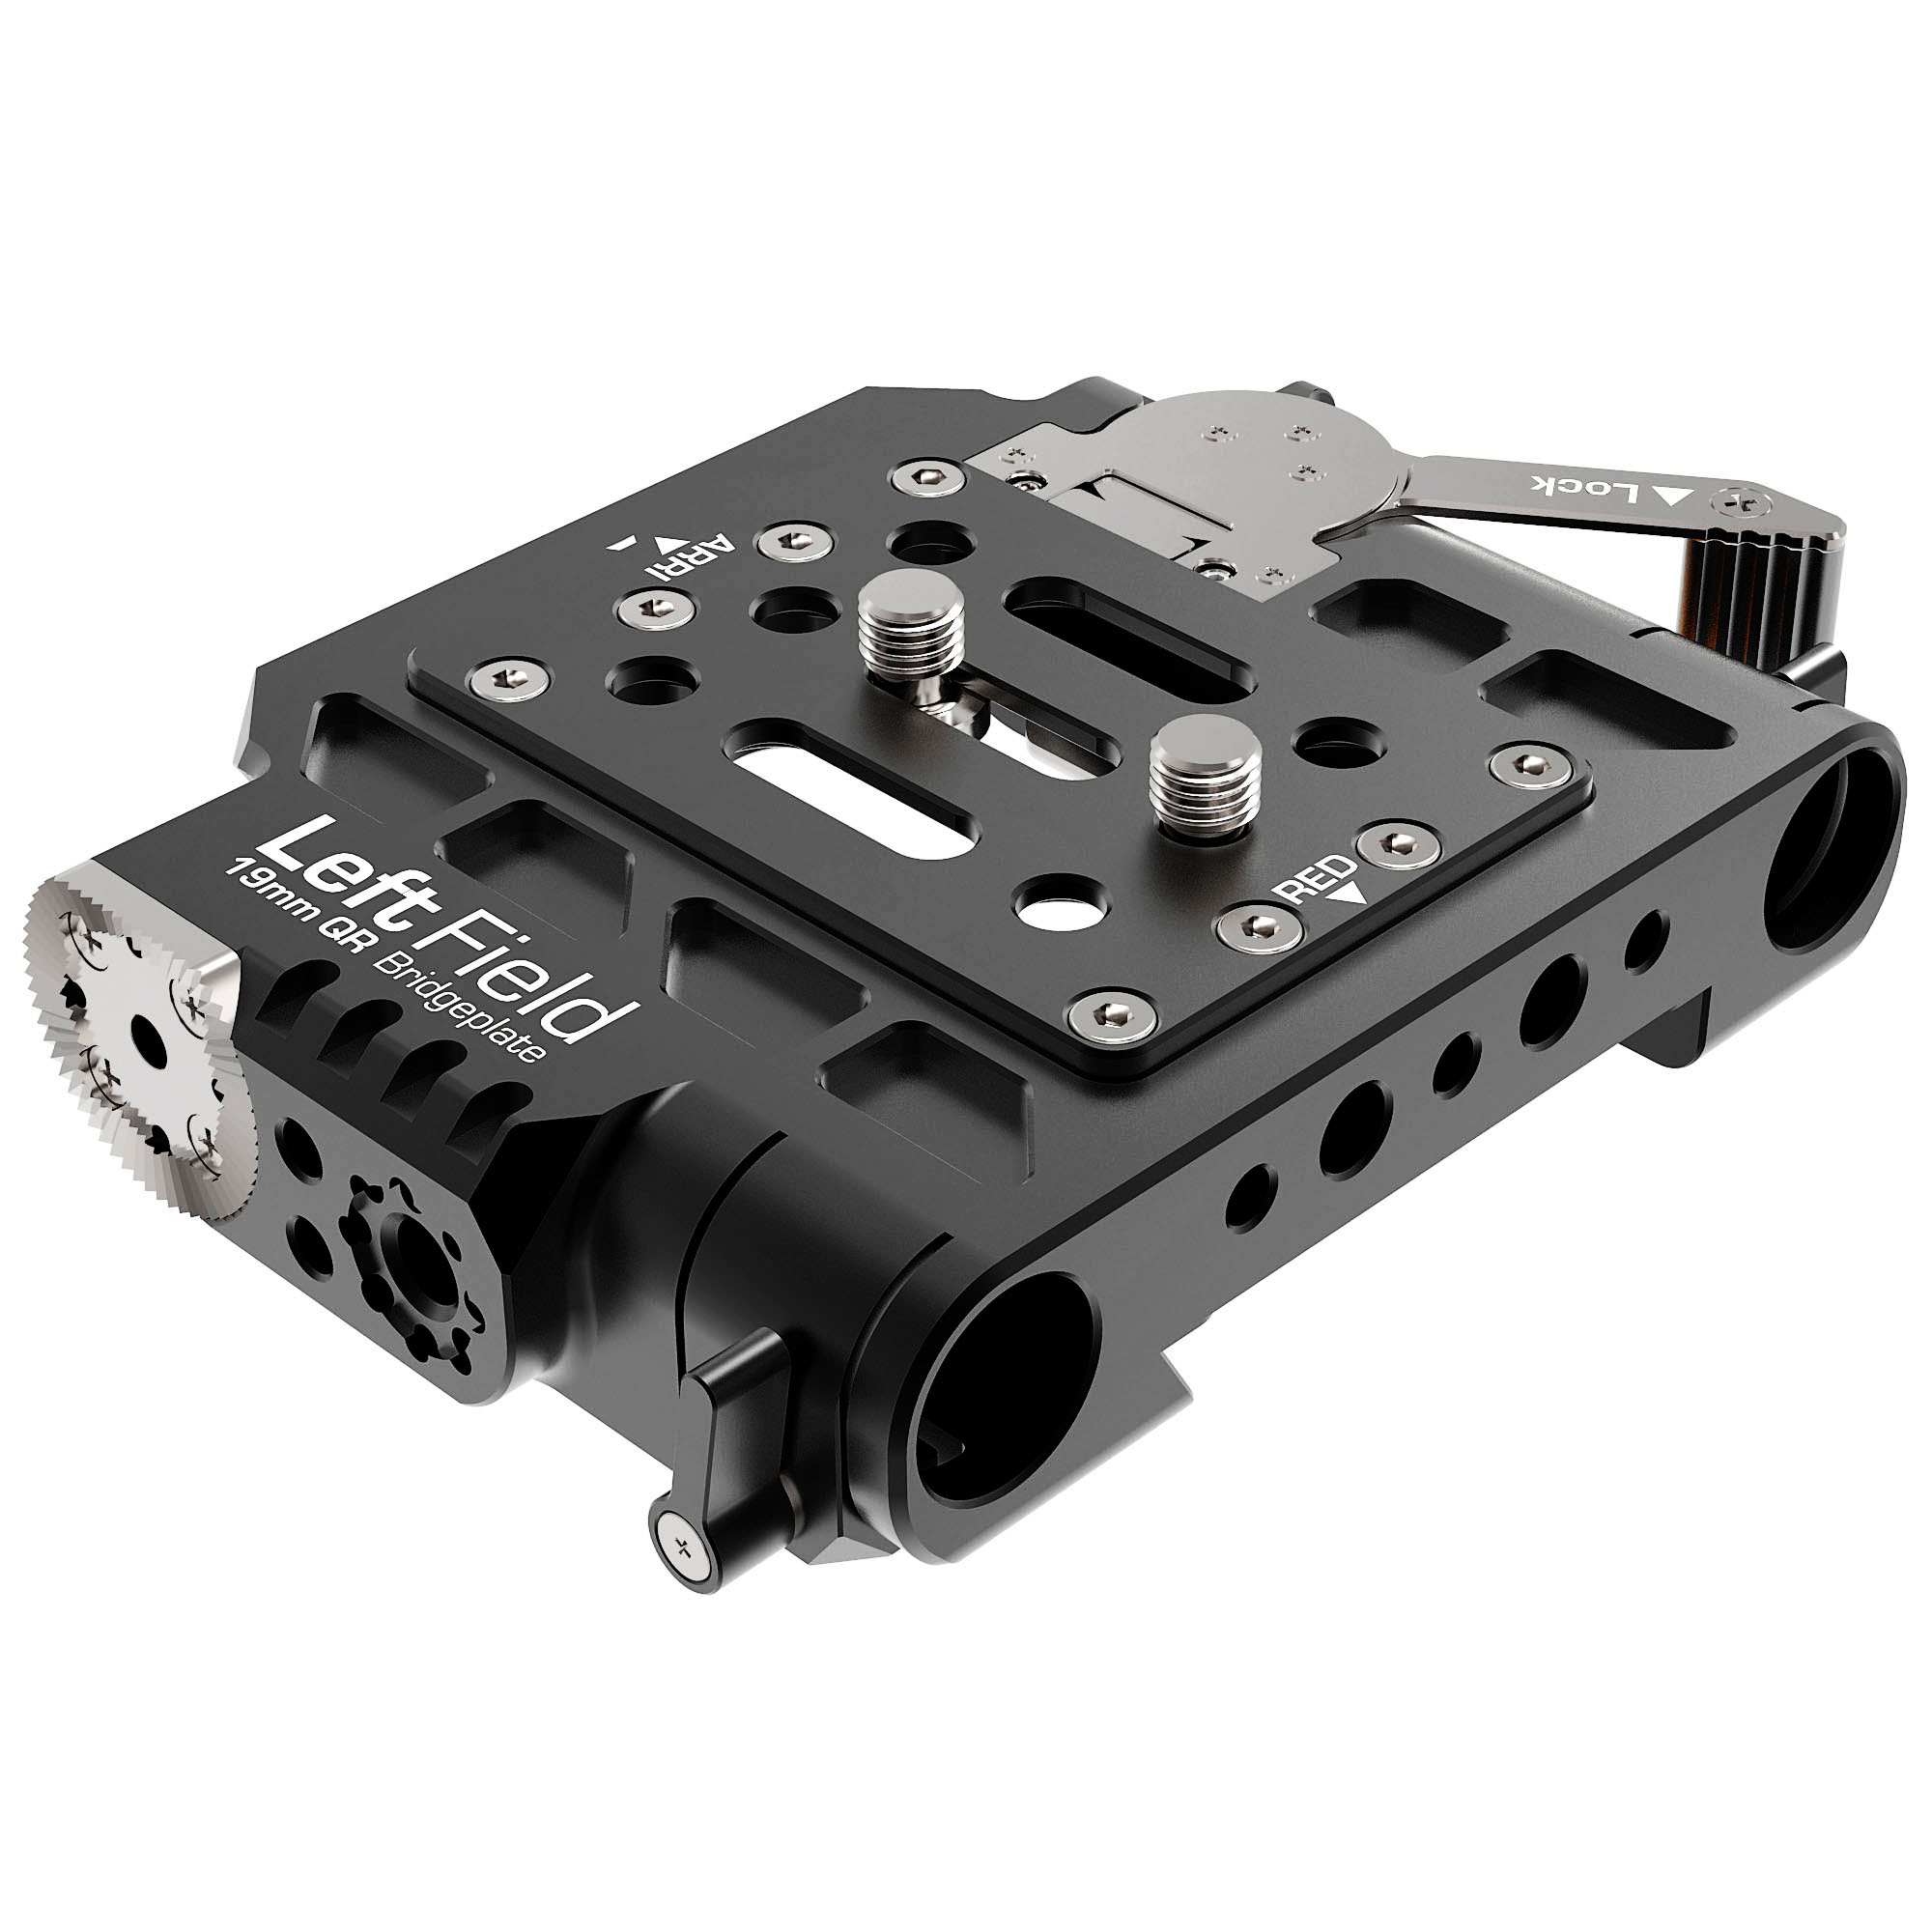 B4003 1002 Left Field 19mm QR Bridgeplate ARRI Mode 1